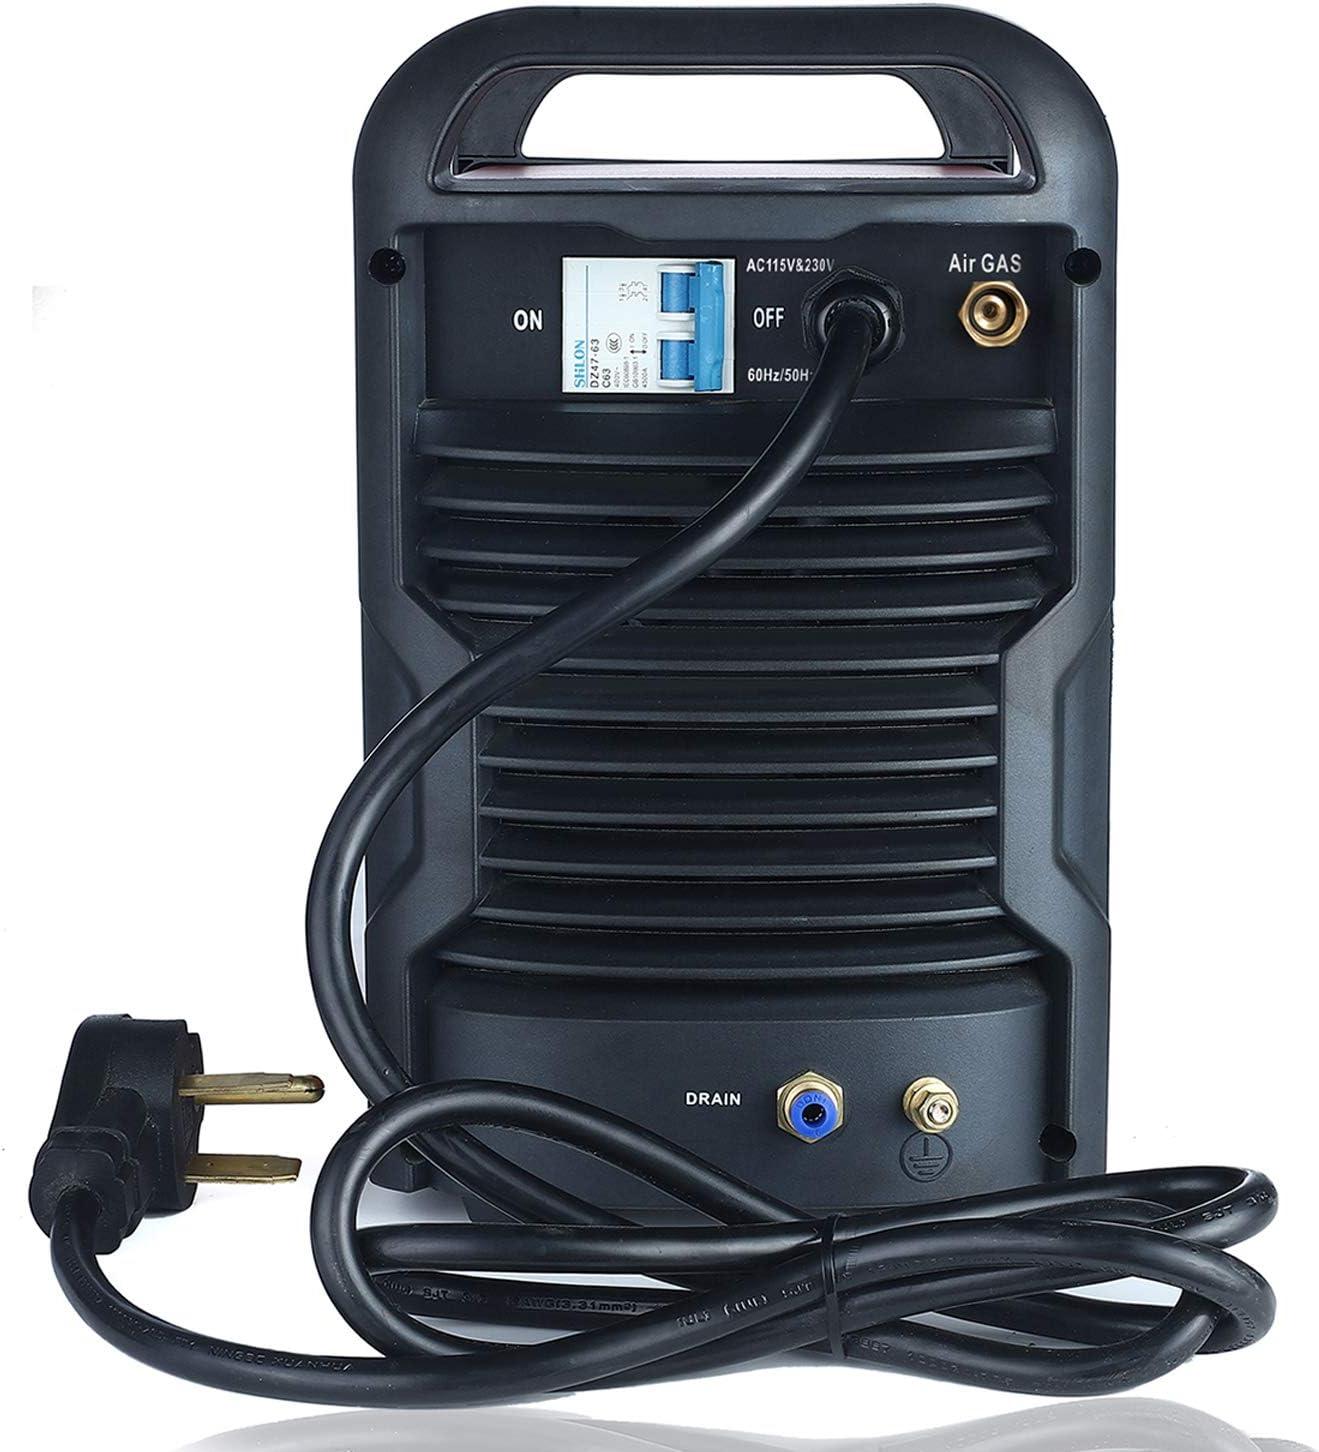 7//8 in Amico CHF-60 60 Amp Plasma Cutter Non-touch Pilot Arc Clean Cut 120//240V Dual Voltage Cutting Machine.